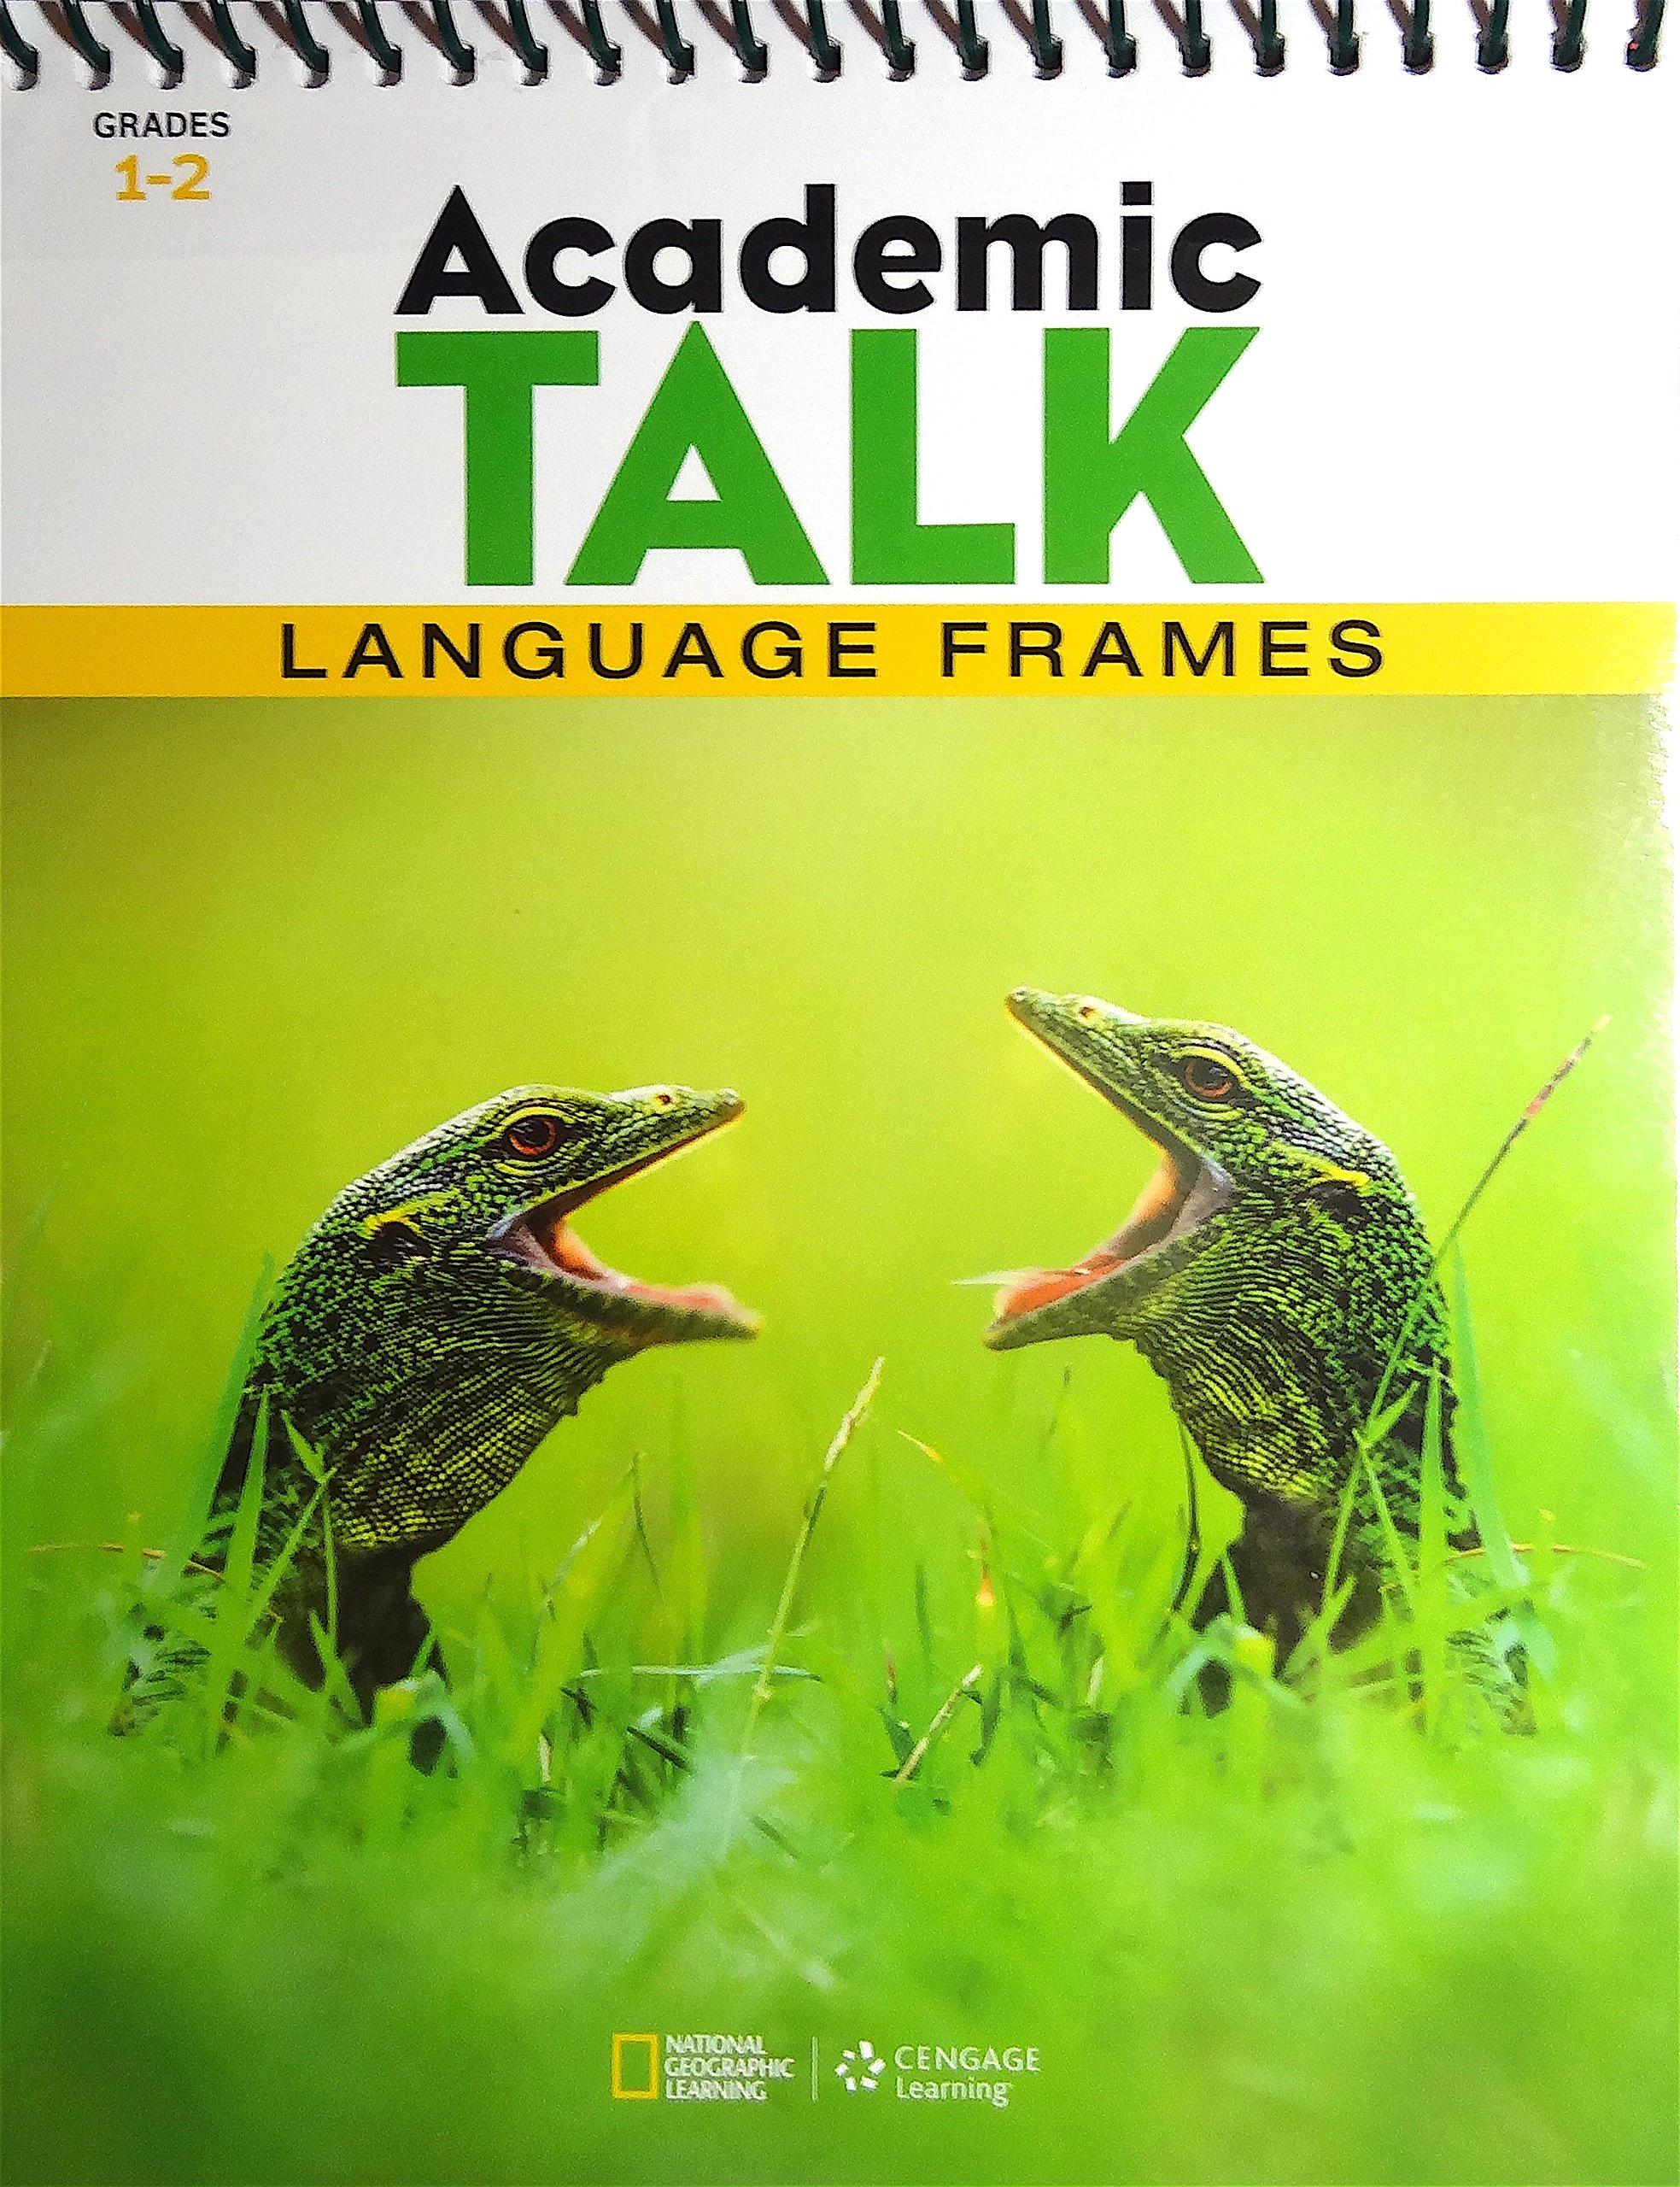 Download National Geographic Learning, Academic TALK, Language Frames, Grades 1-2 Flipchart PDF